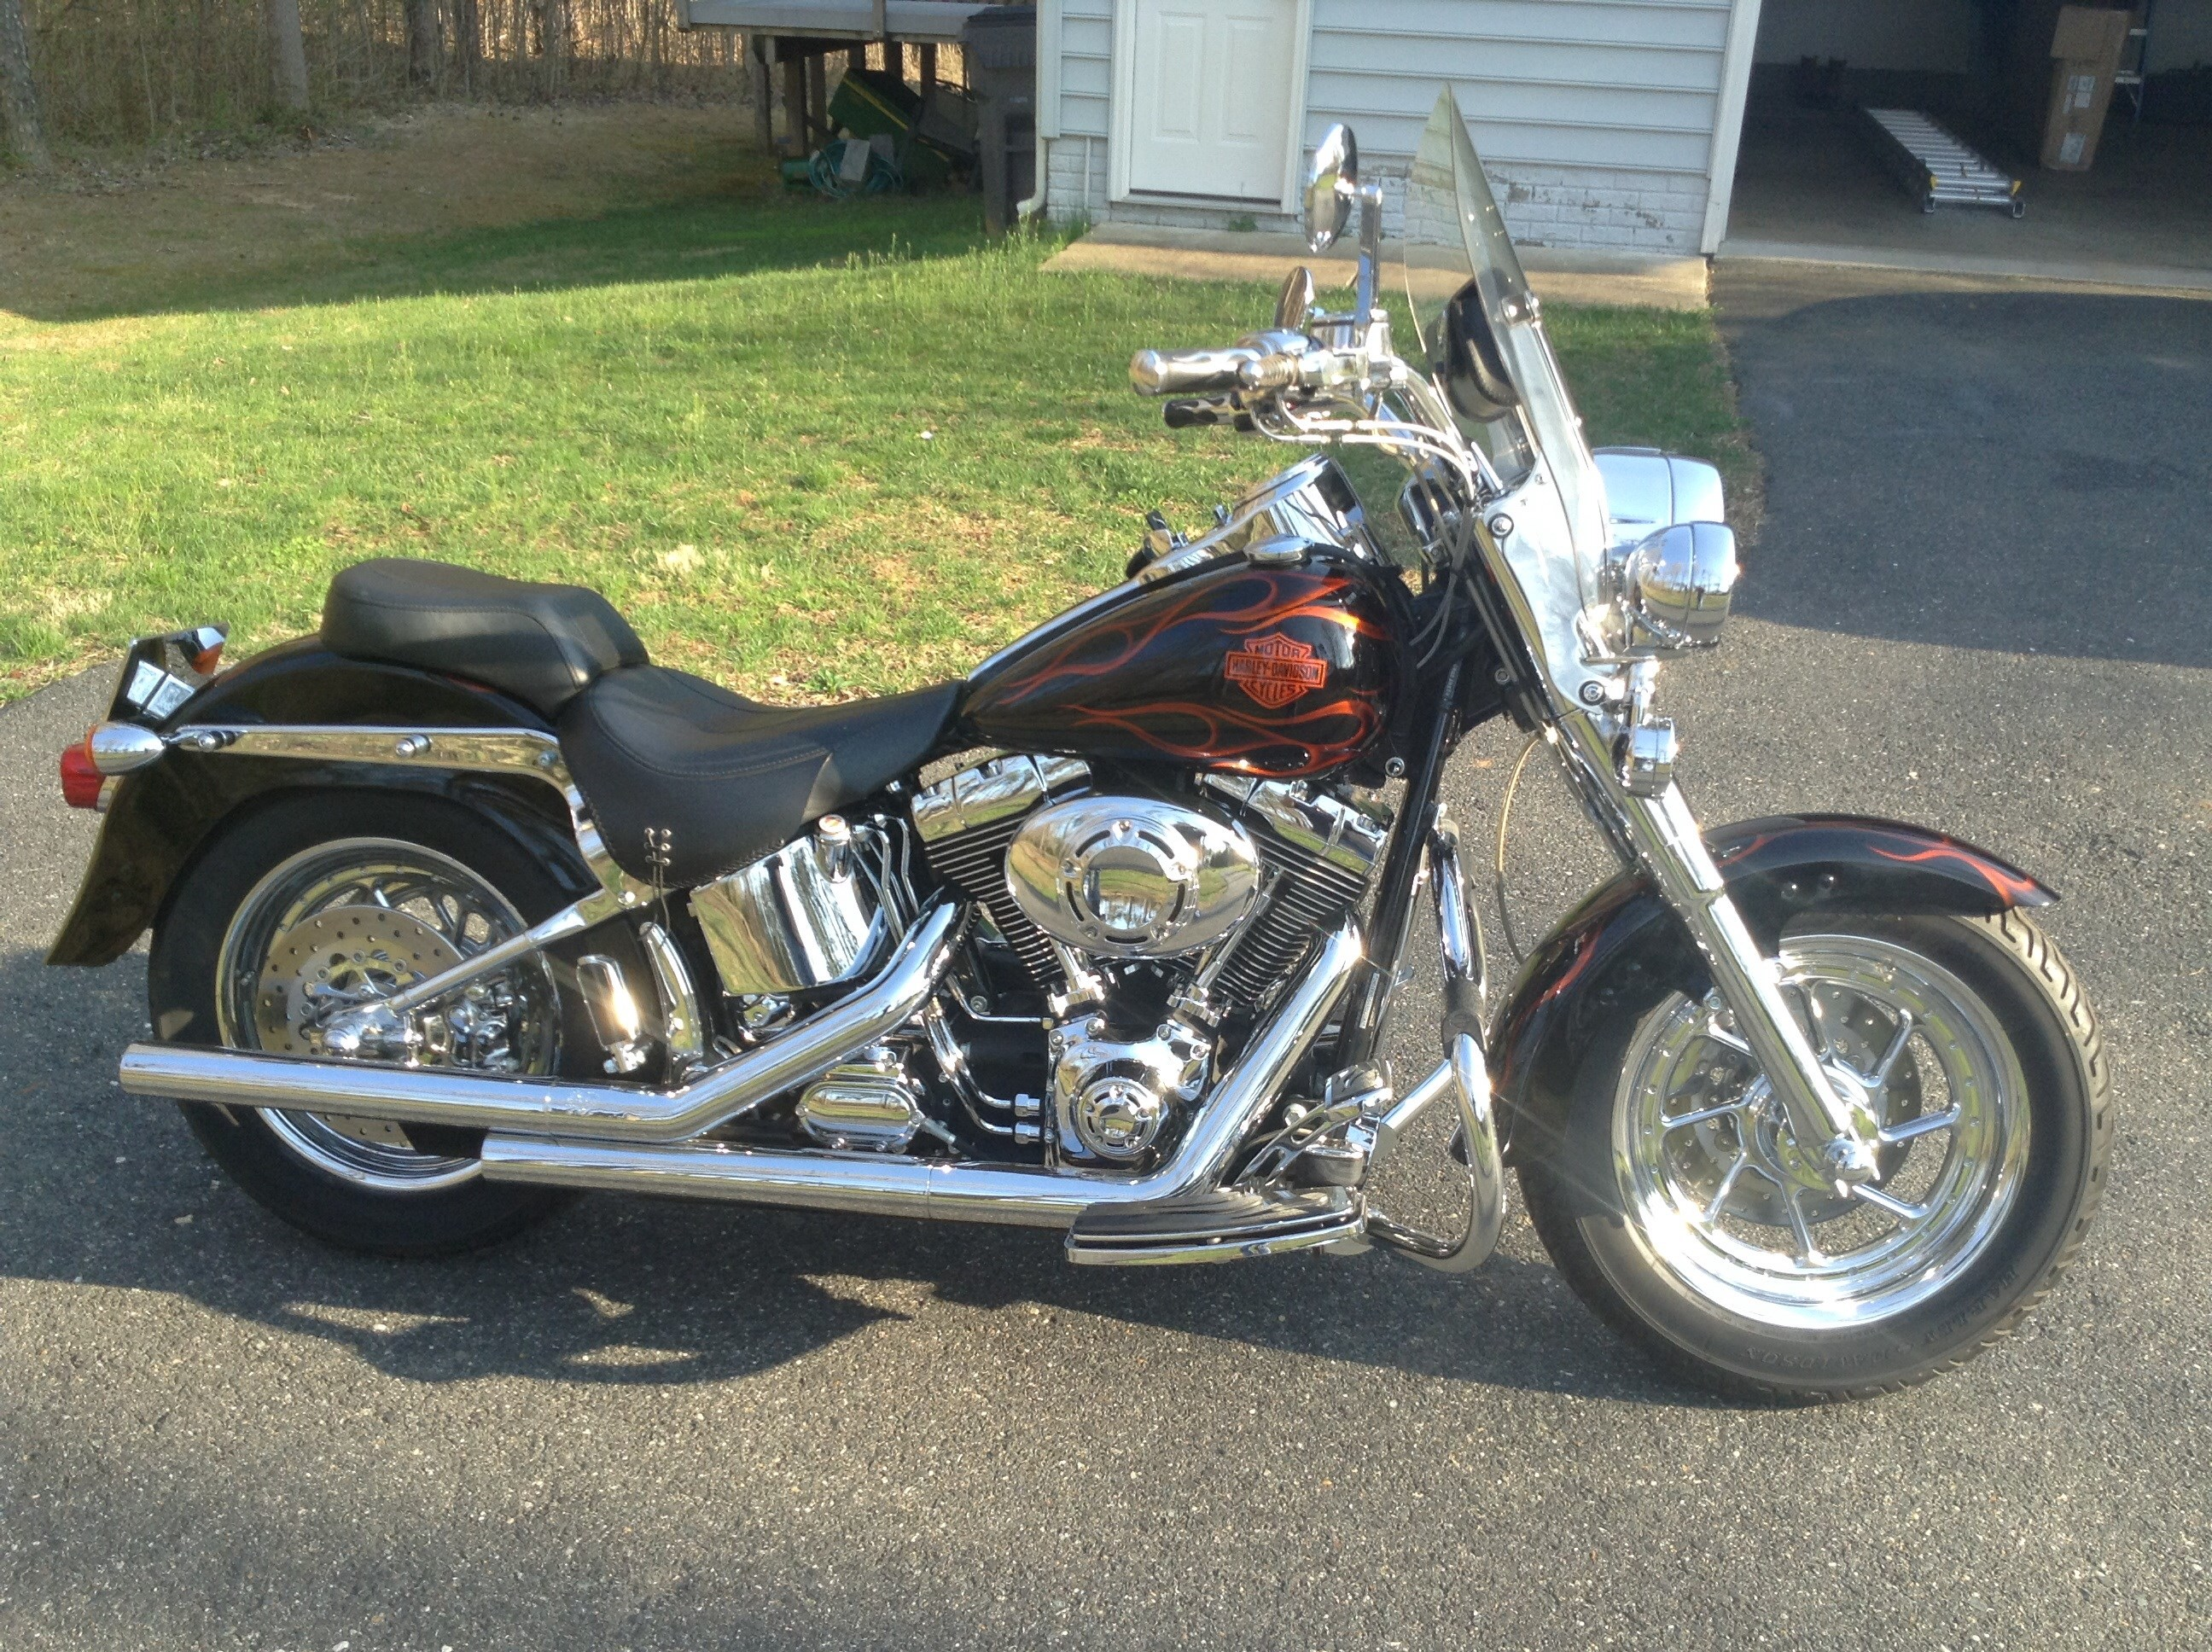 Whitt S Harley Davidson Sold